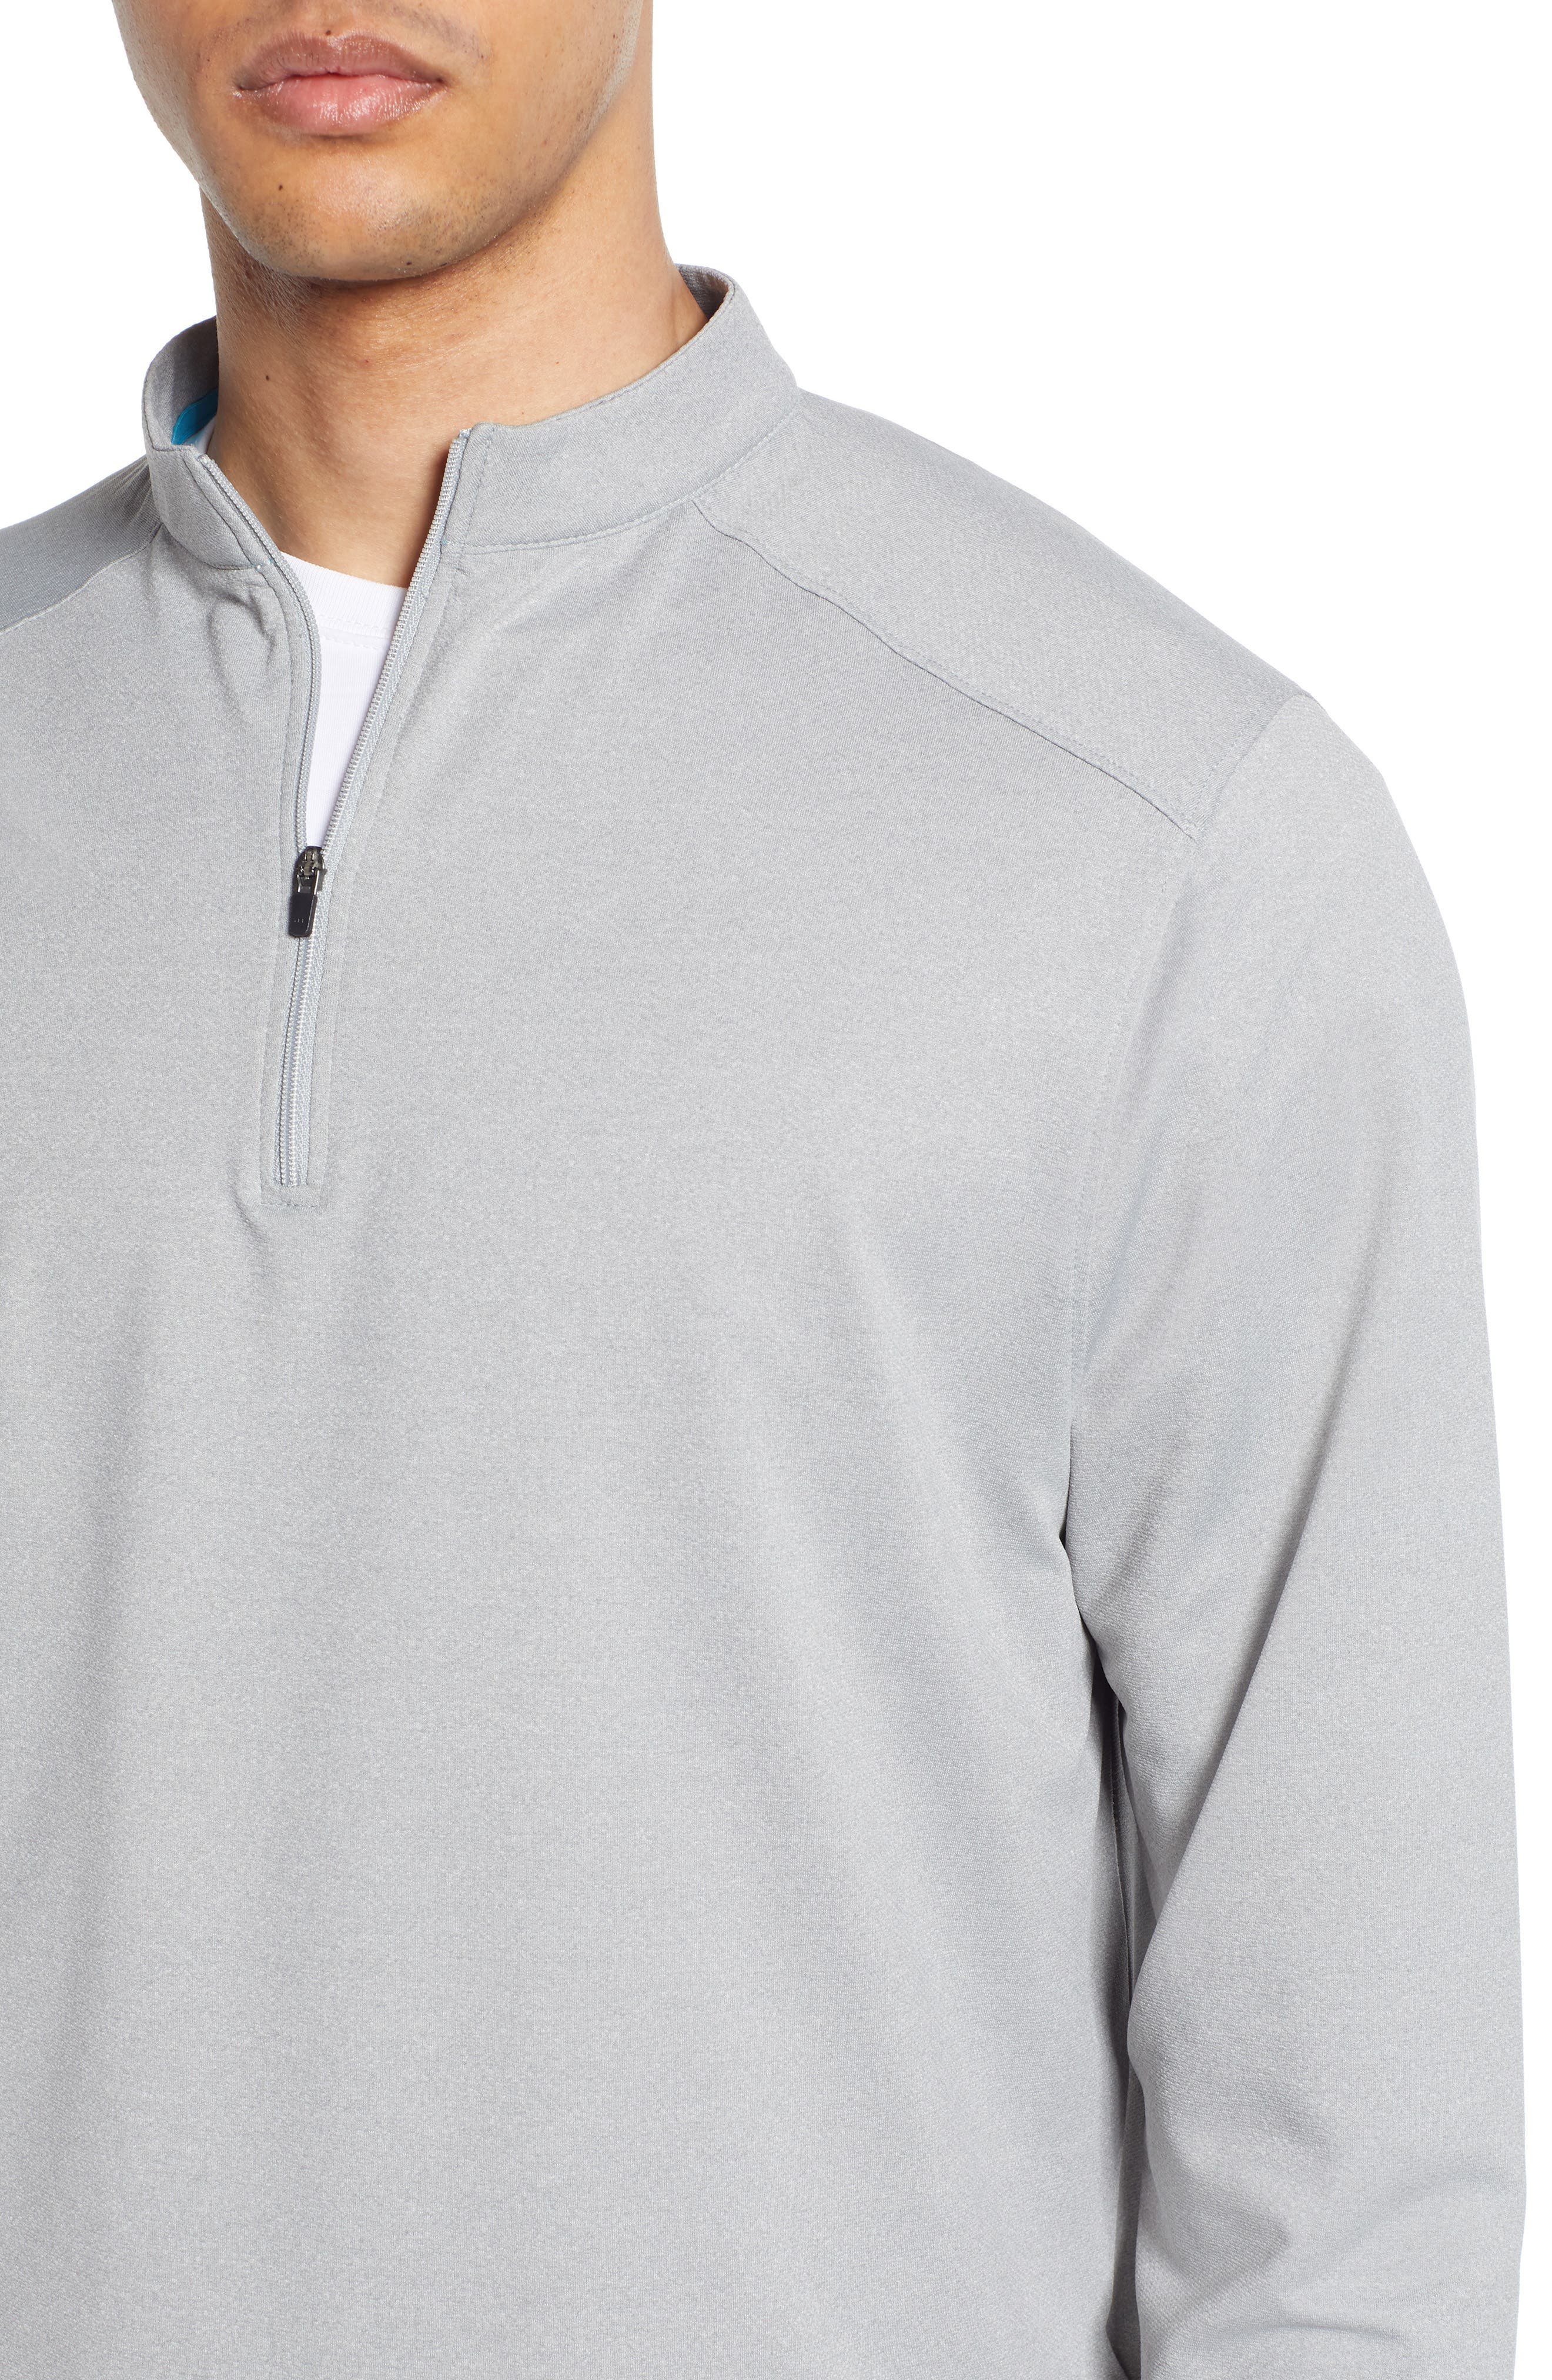 DEVEREUX, Lay-Low Half Zip Pullover, Alternate thumbnail 4, color, ASPHALT